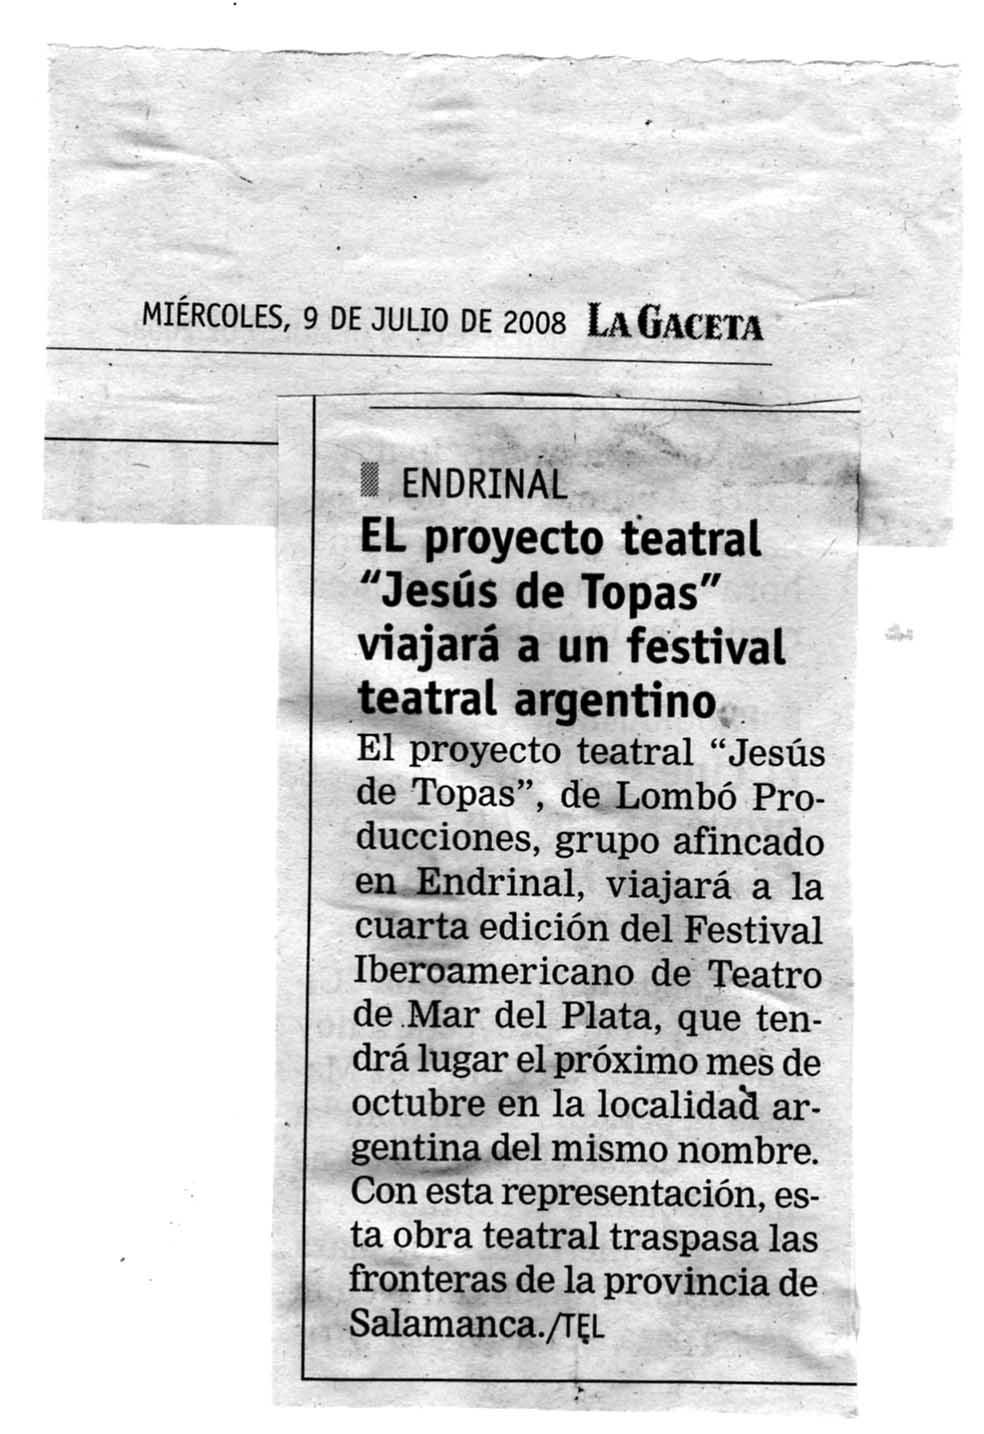 """Jesús de Topas"" invitado al Festival Iberoamericano de Teatro de Mar del Plata (Argentina)"